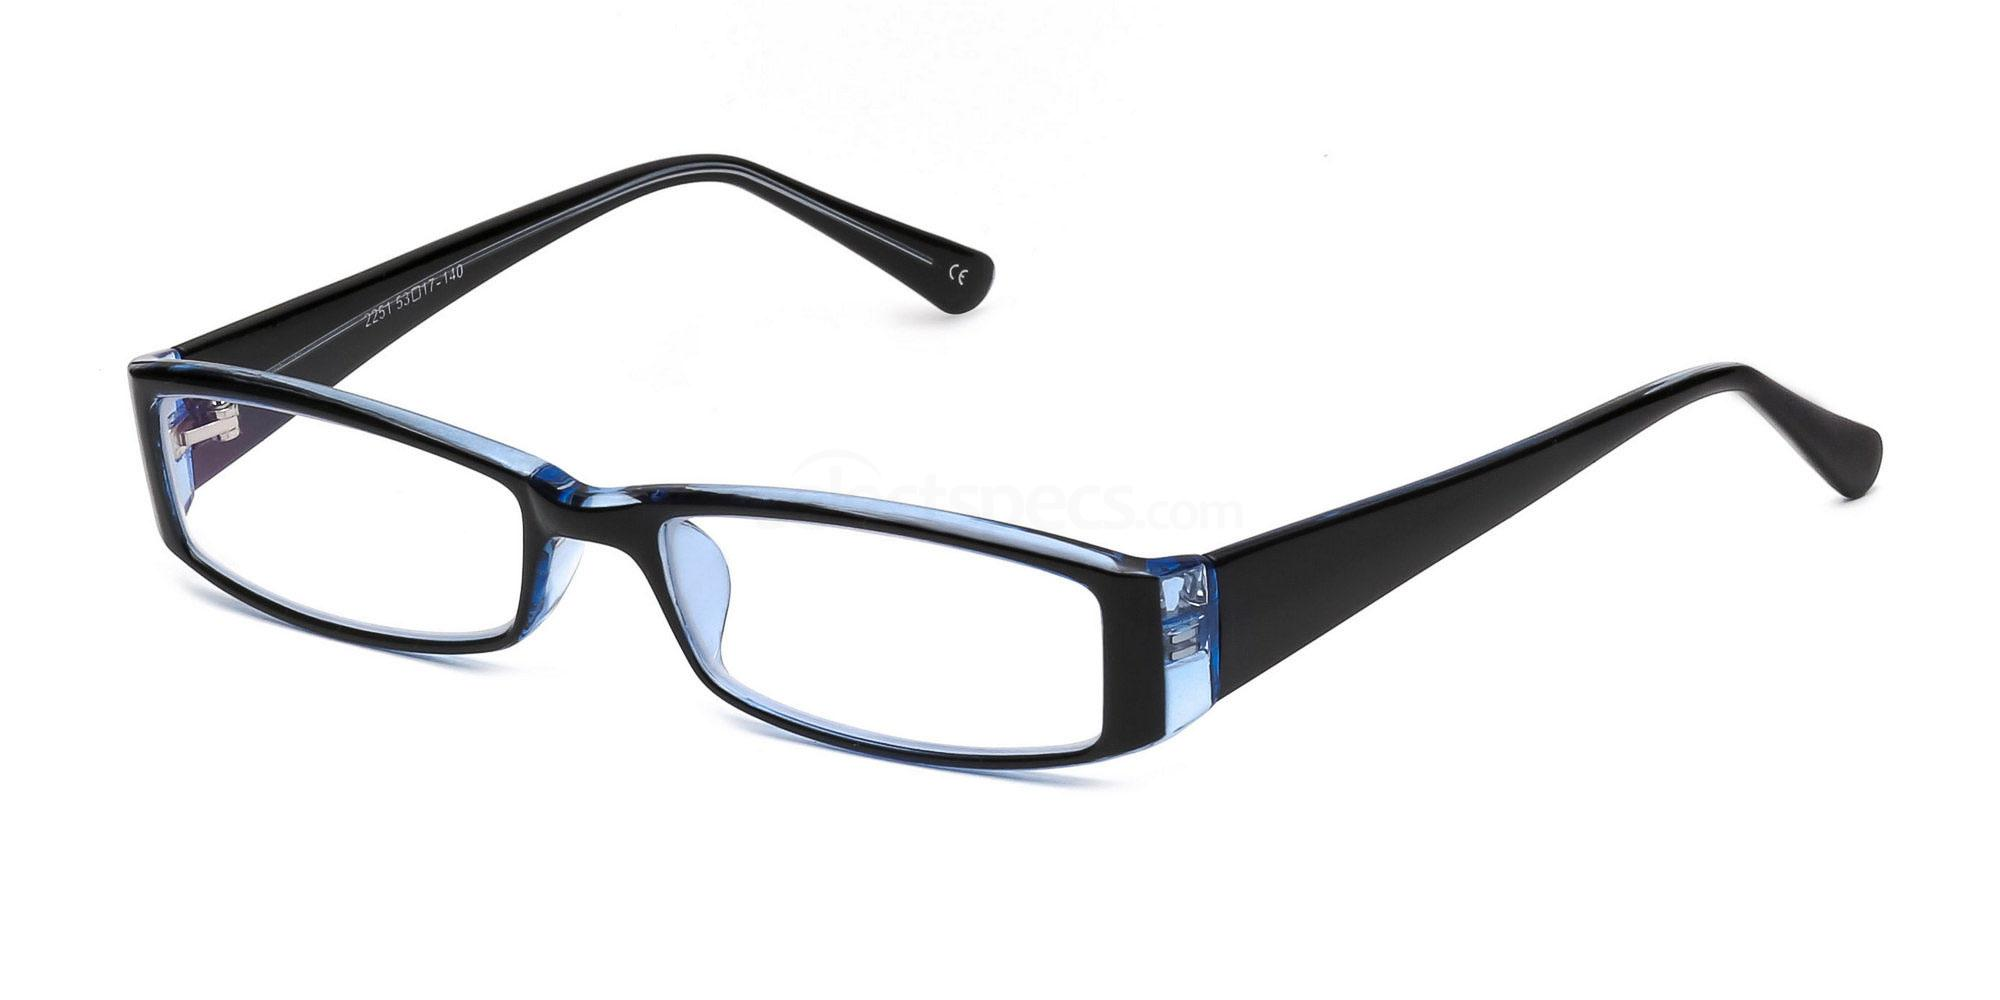 C48 P2251 - Black and Blue Glasses, SelectSpecs